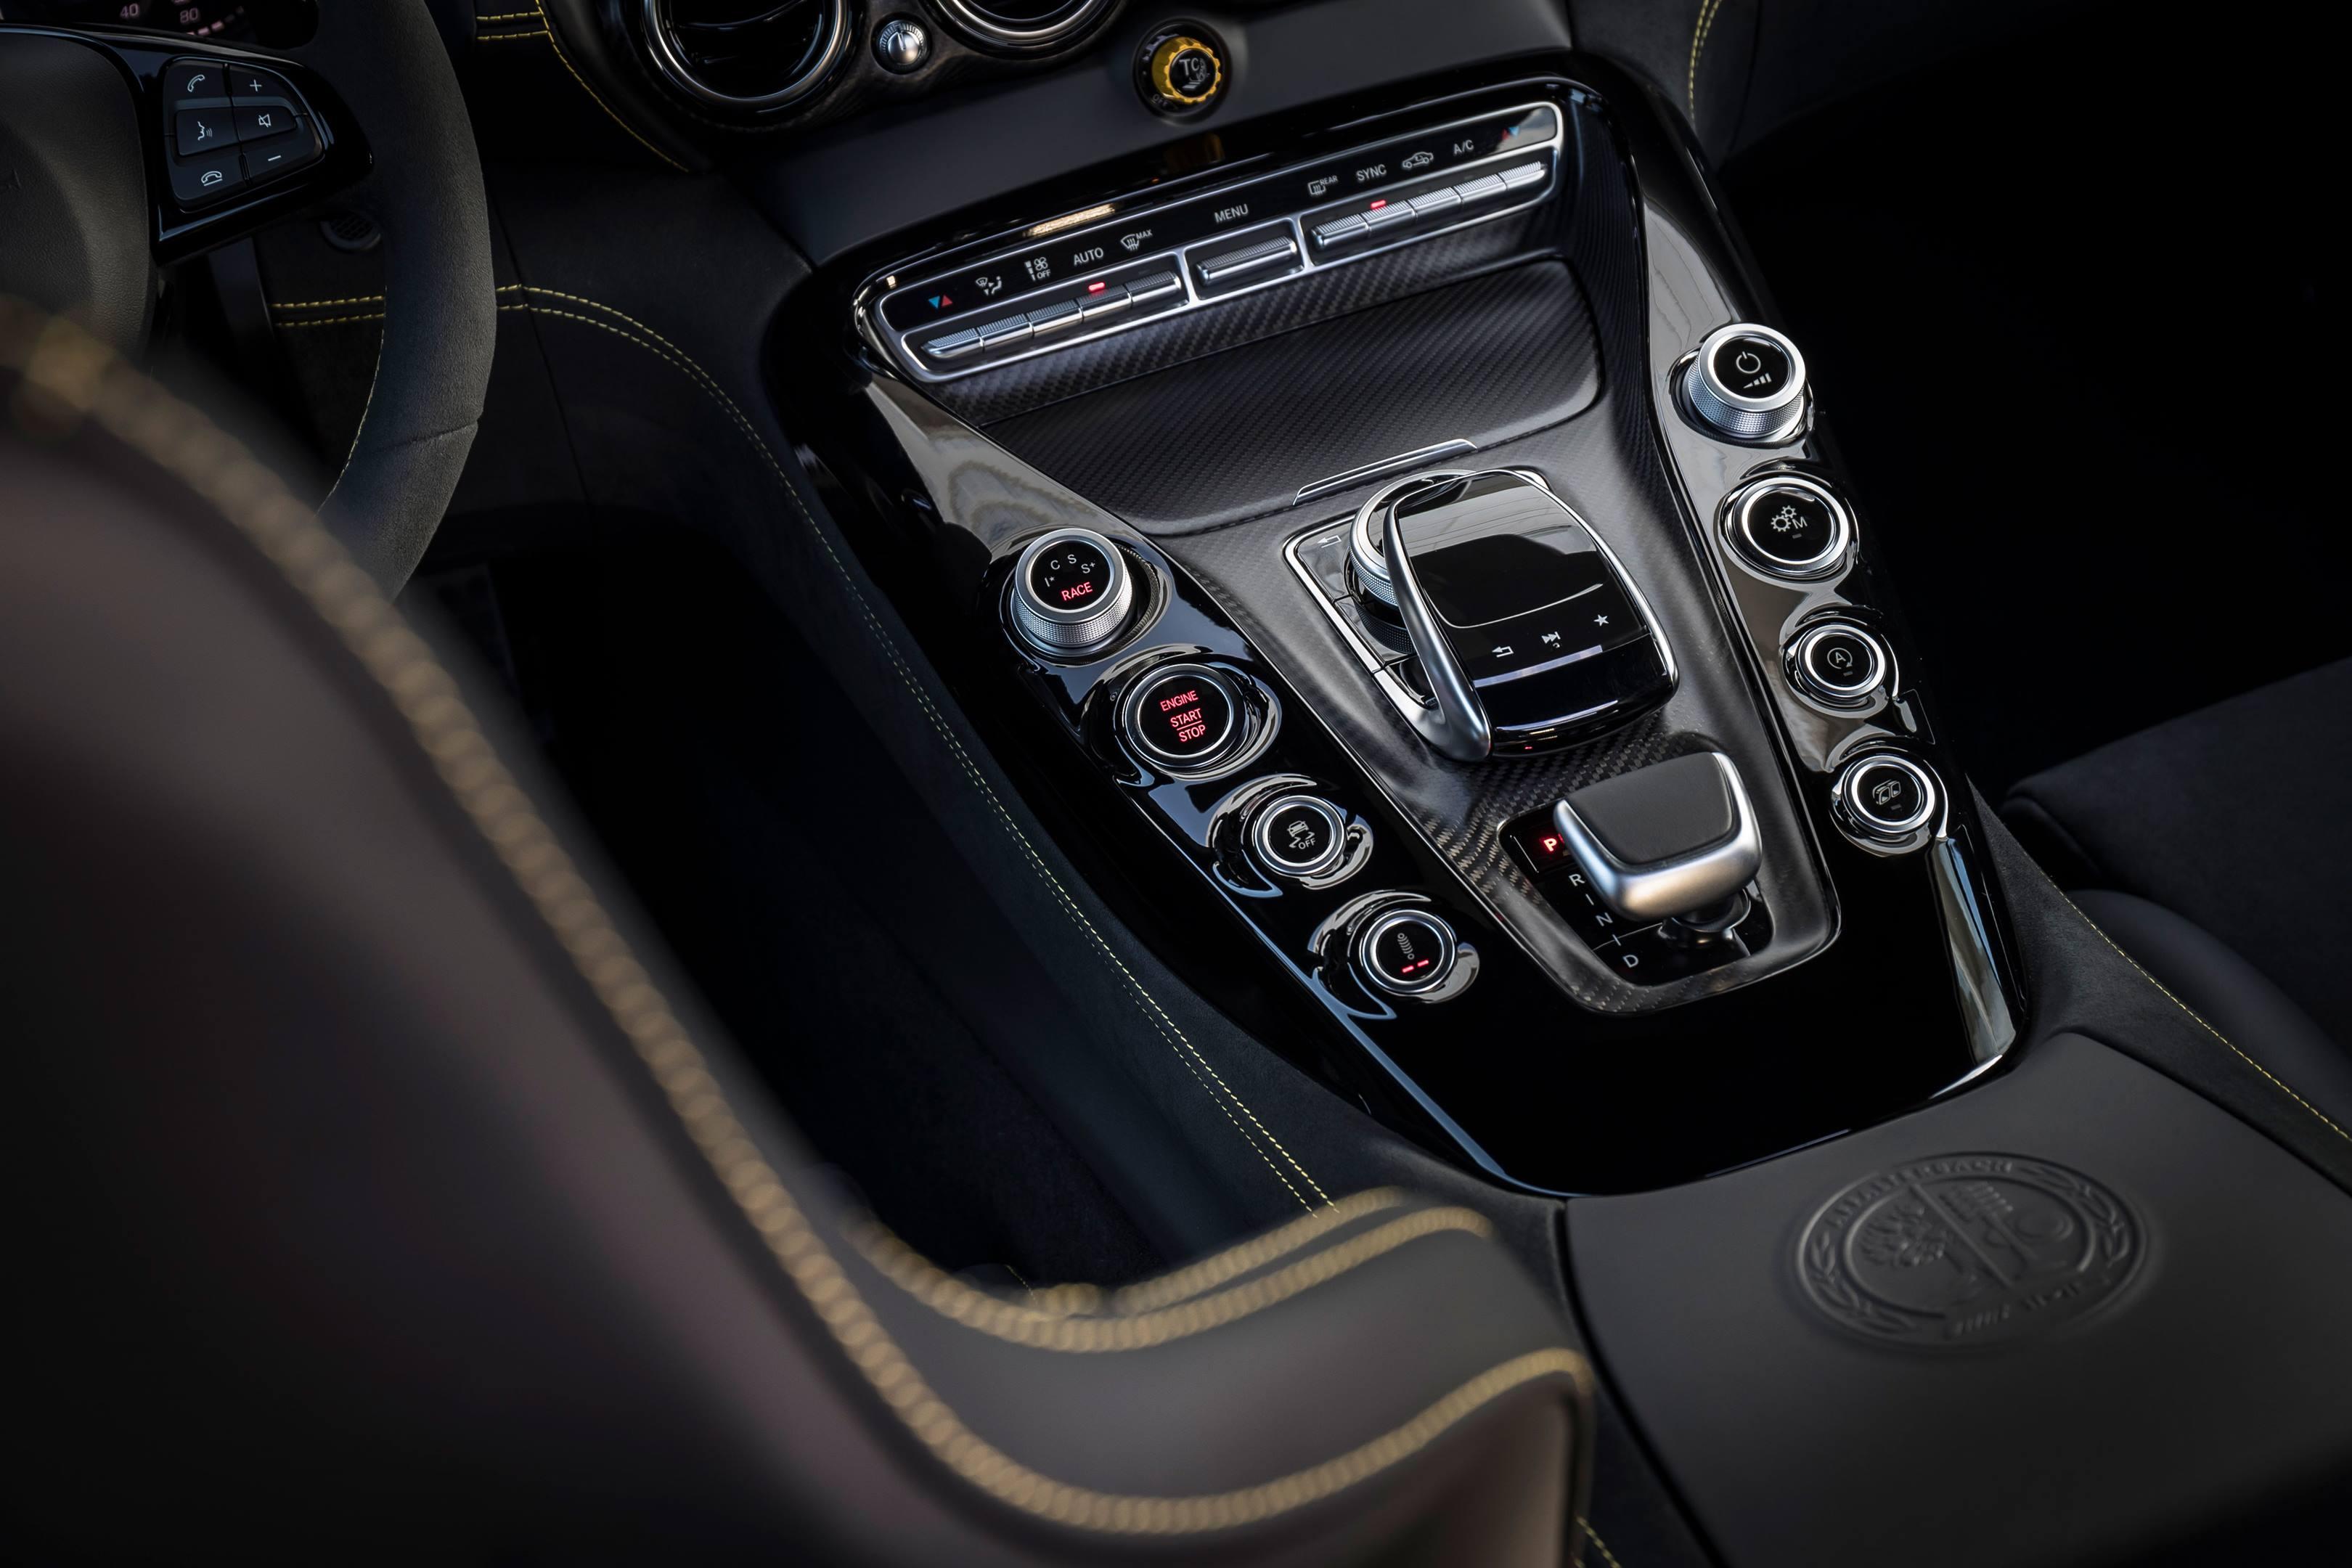 2018 Mercedes-AMG GT R center console